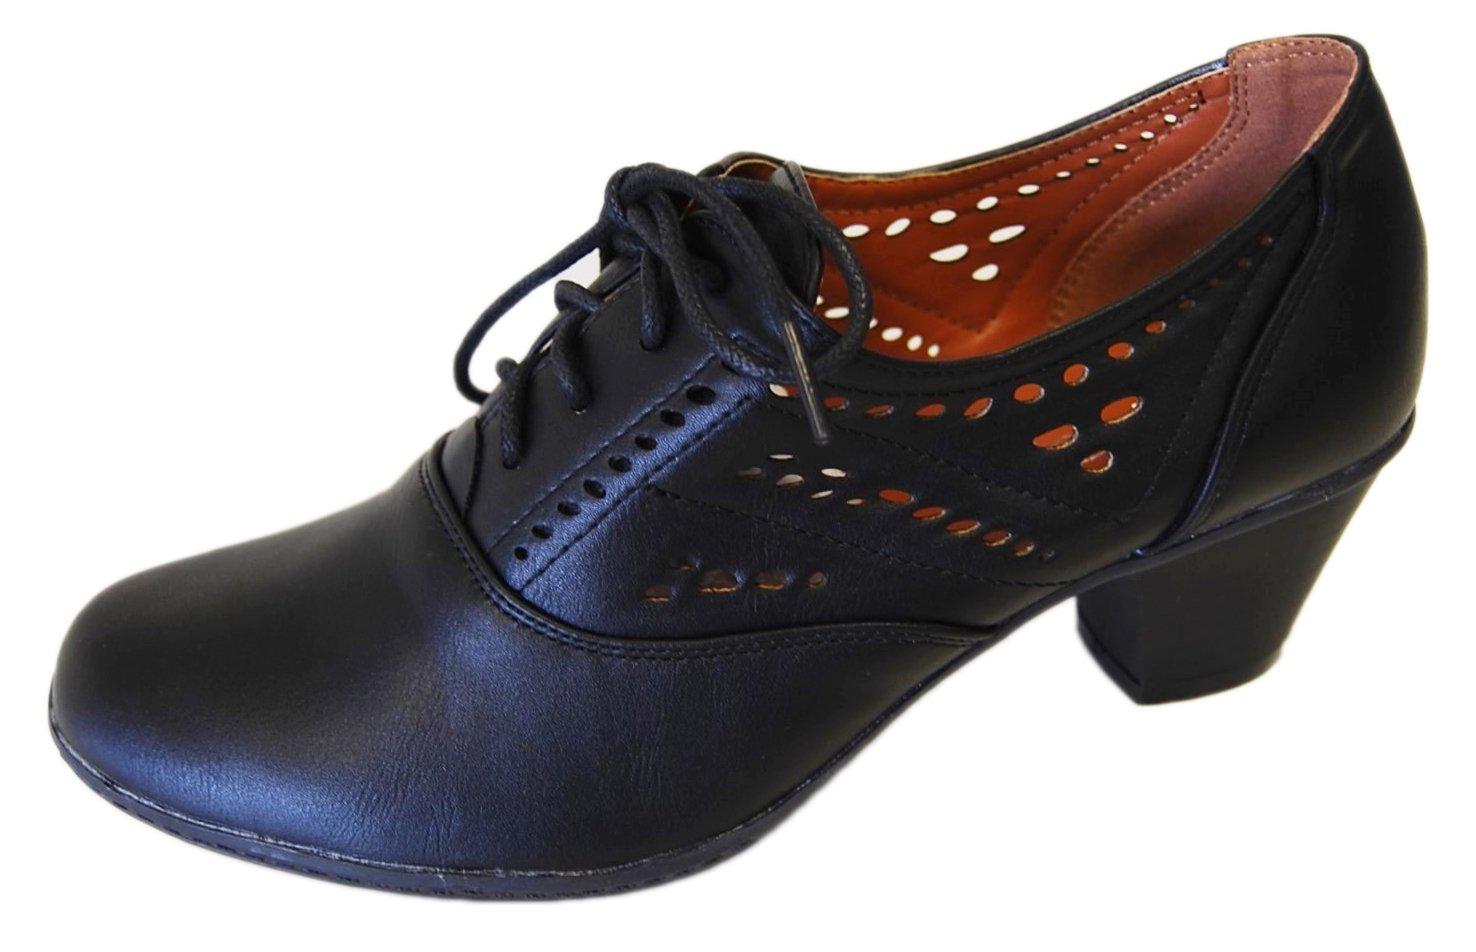 Refresh Women's London-01 Cutout Dressy Heeled Lace up Oxford Shoe (8.5 B(M) US, Black)